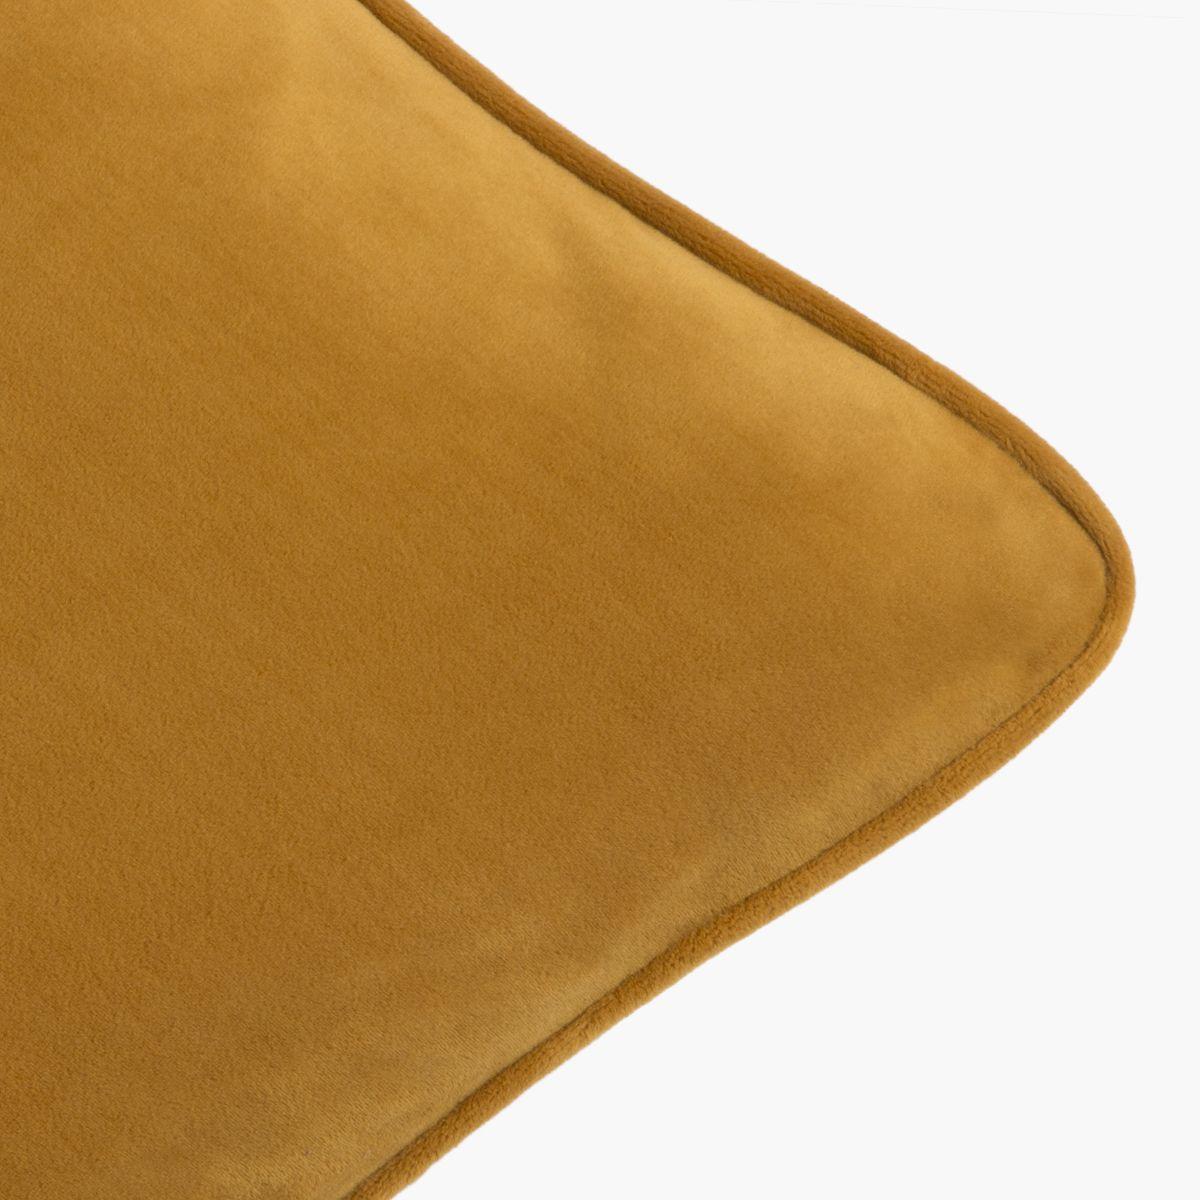 Cojí de terciopelo mostaza. Mustard velvet cushion.